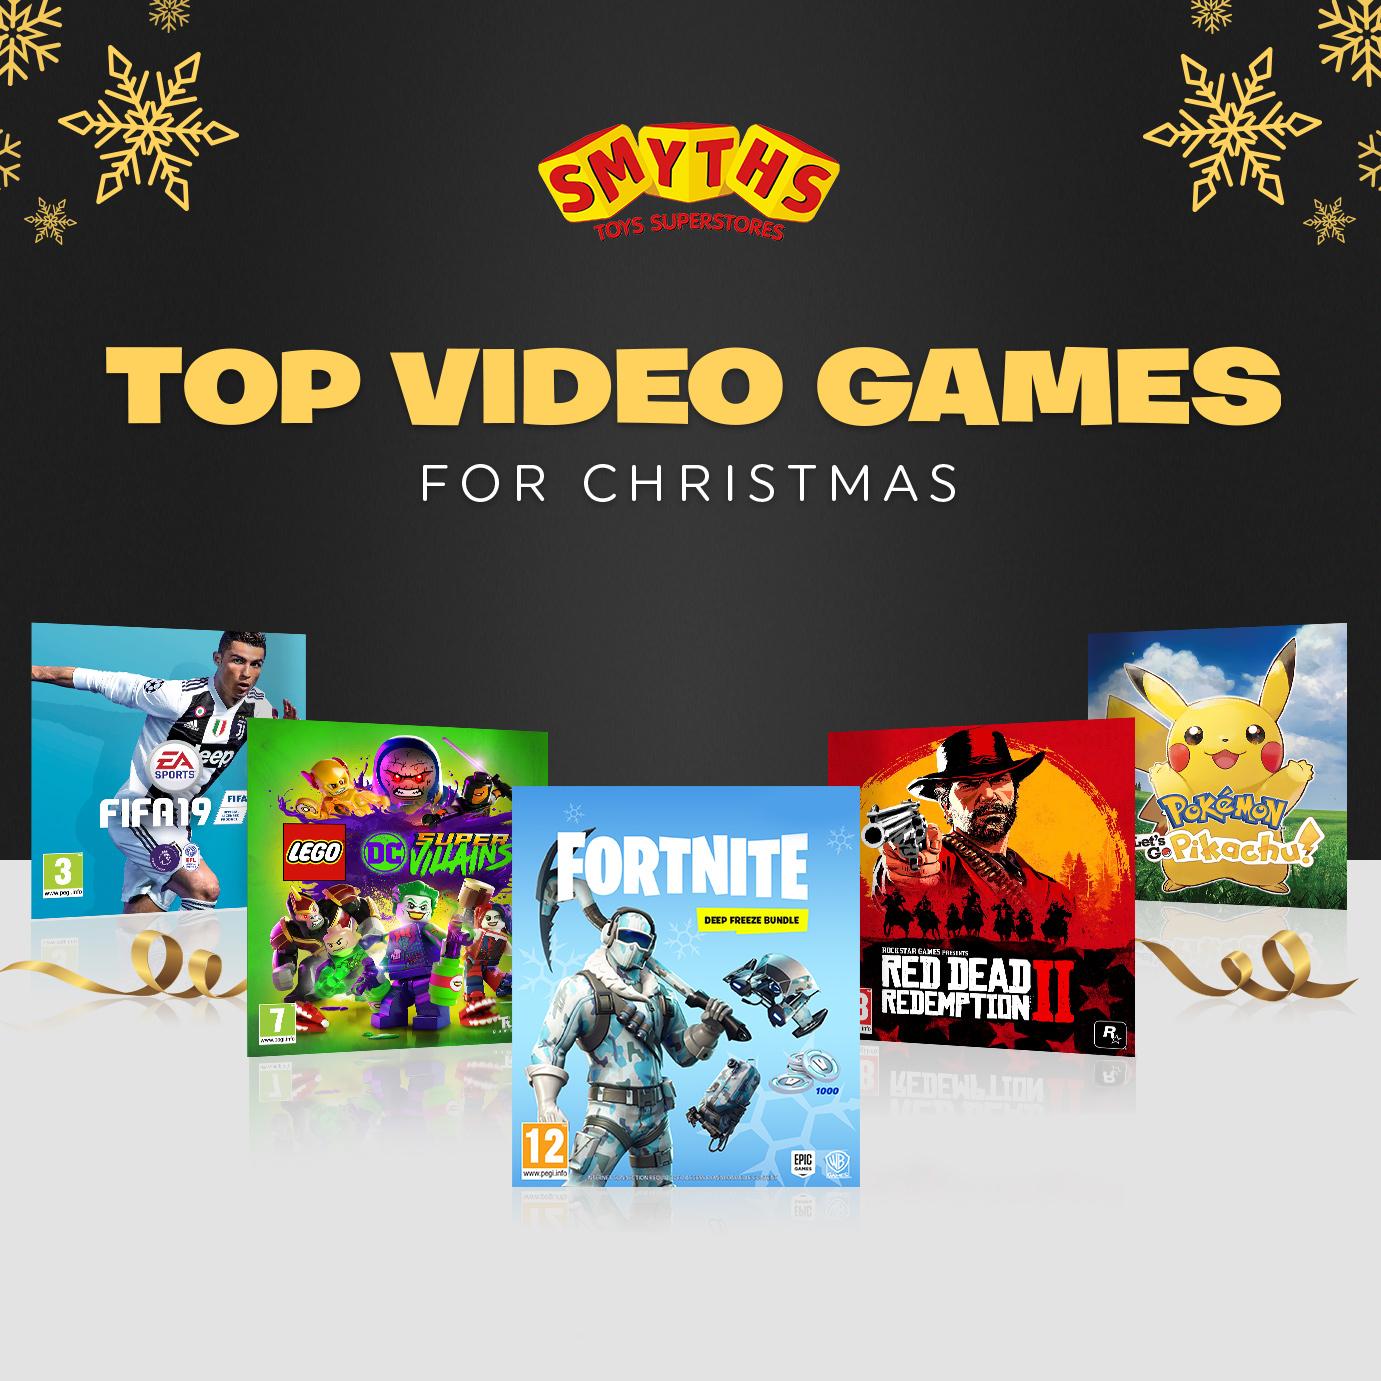 Top-Video Games-Press-Release-1000x1000.jpg